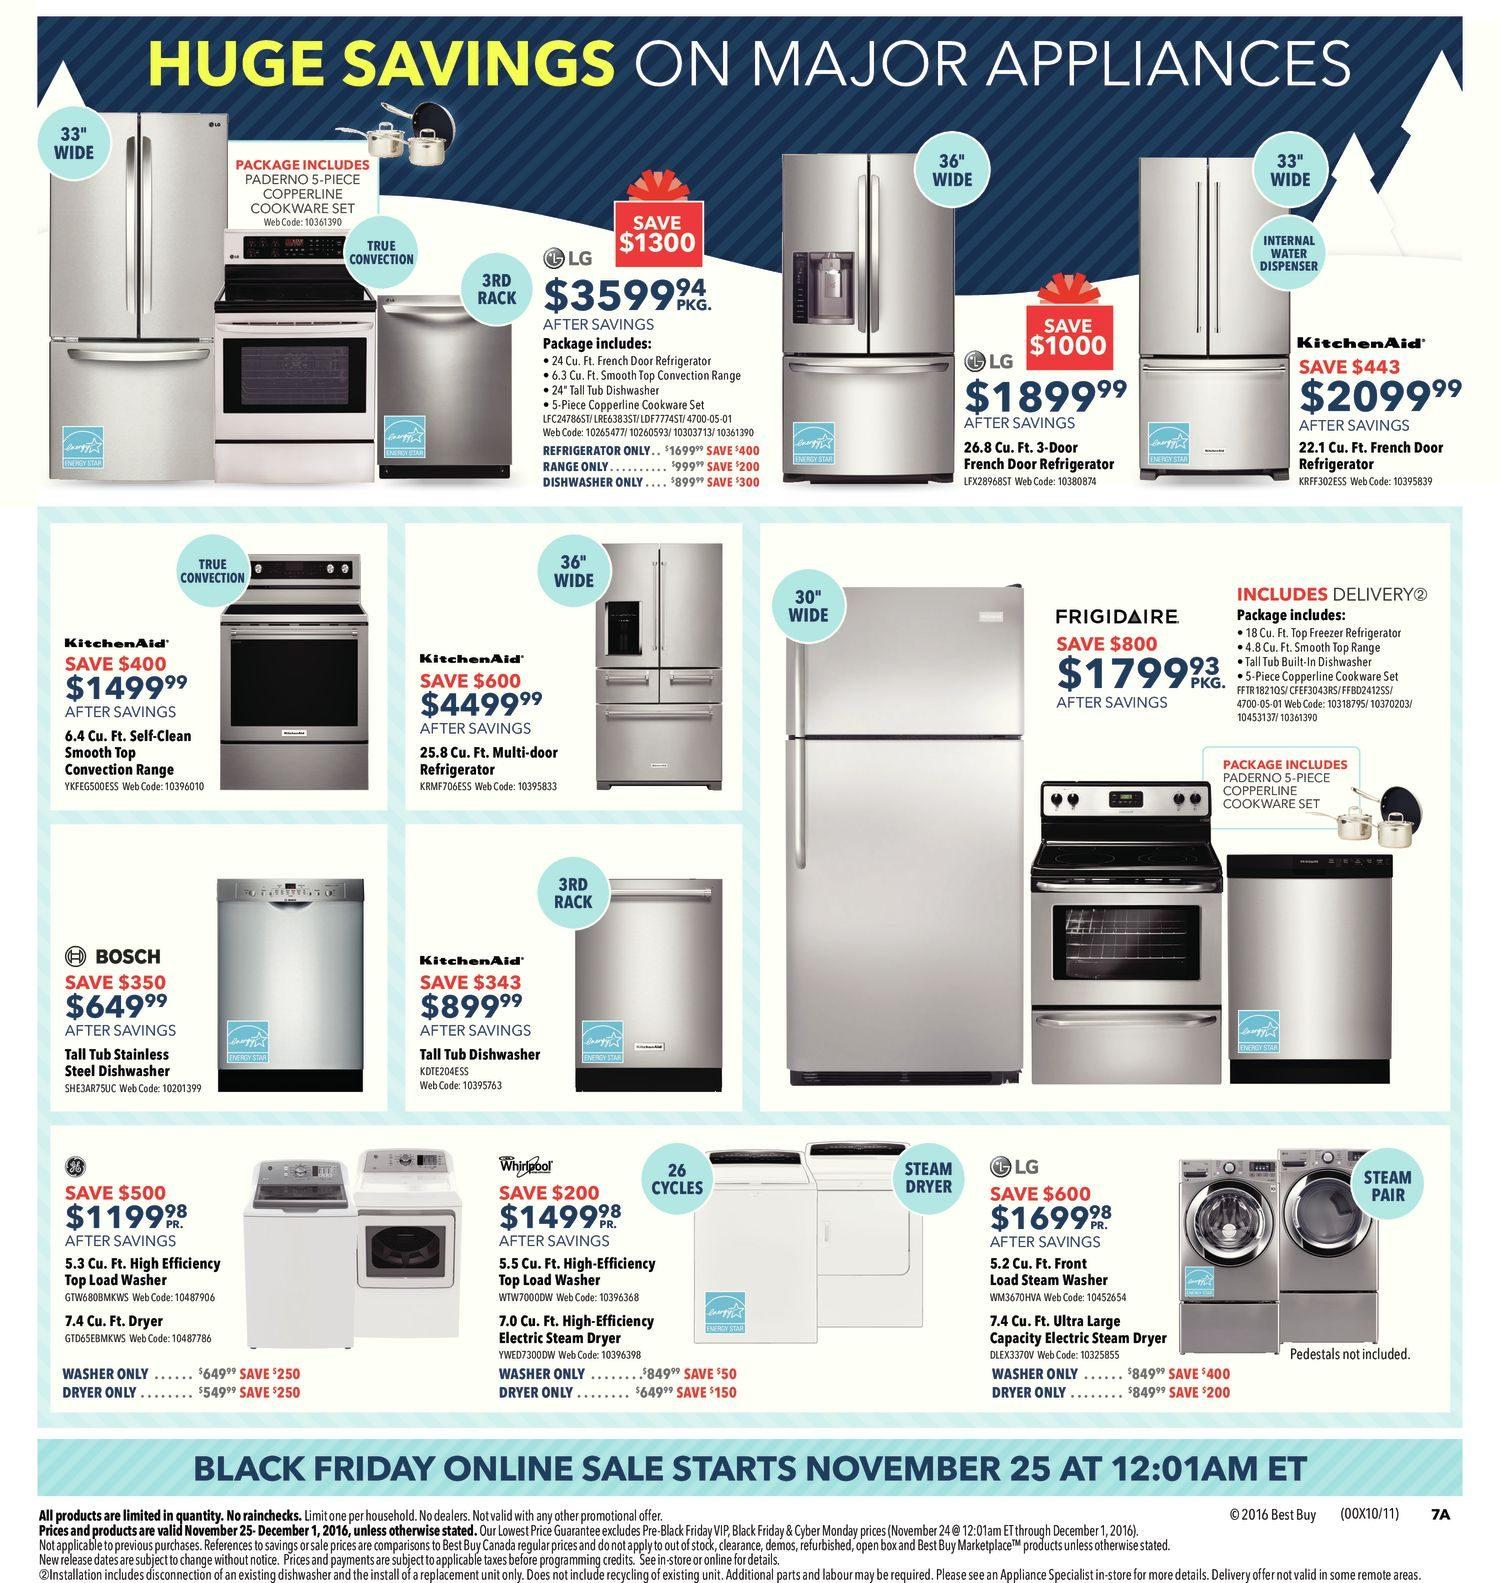 American Standard Tp 0002 B 609 Kitchen Sink Faucet Wm Cr Daftar La Vita Sh Lever Handle Lavatory F080c002 Page 2